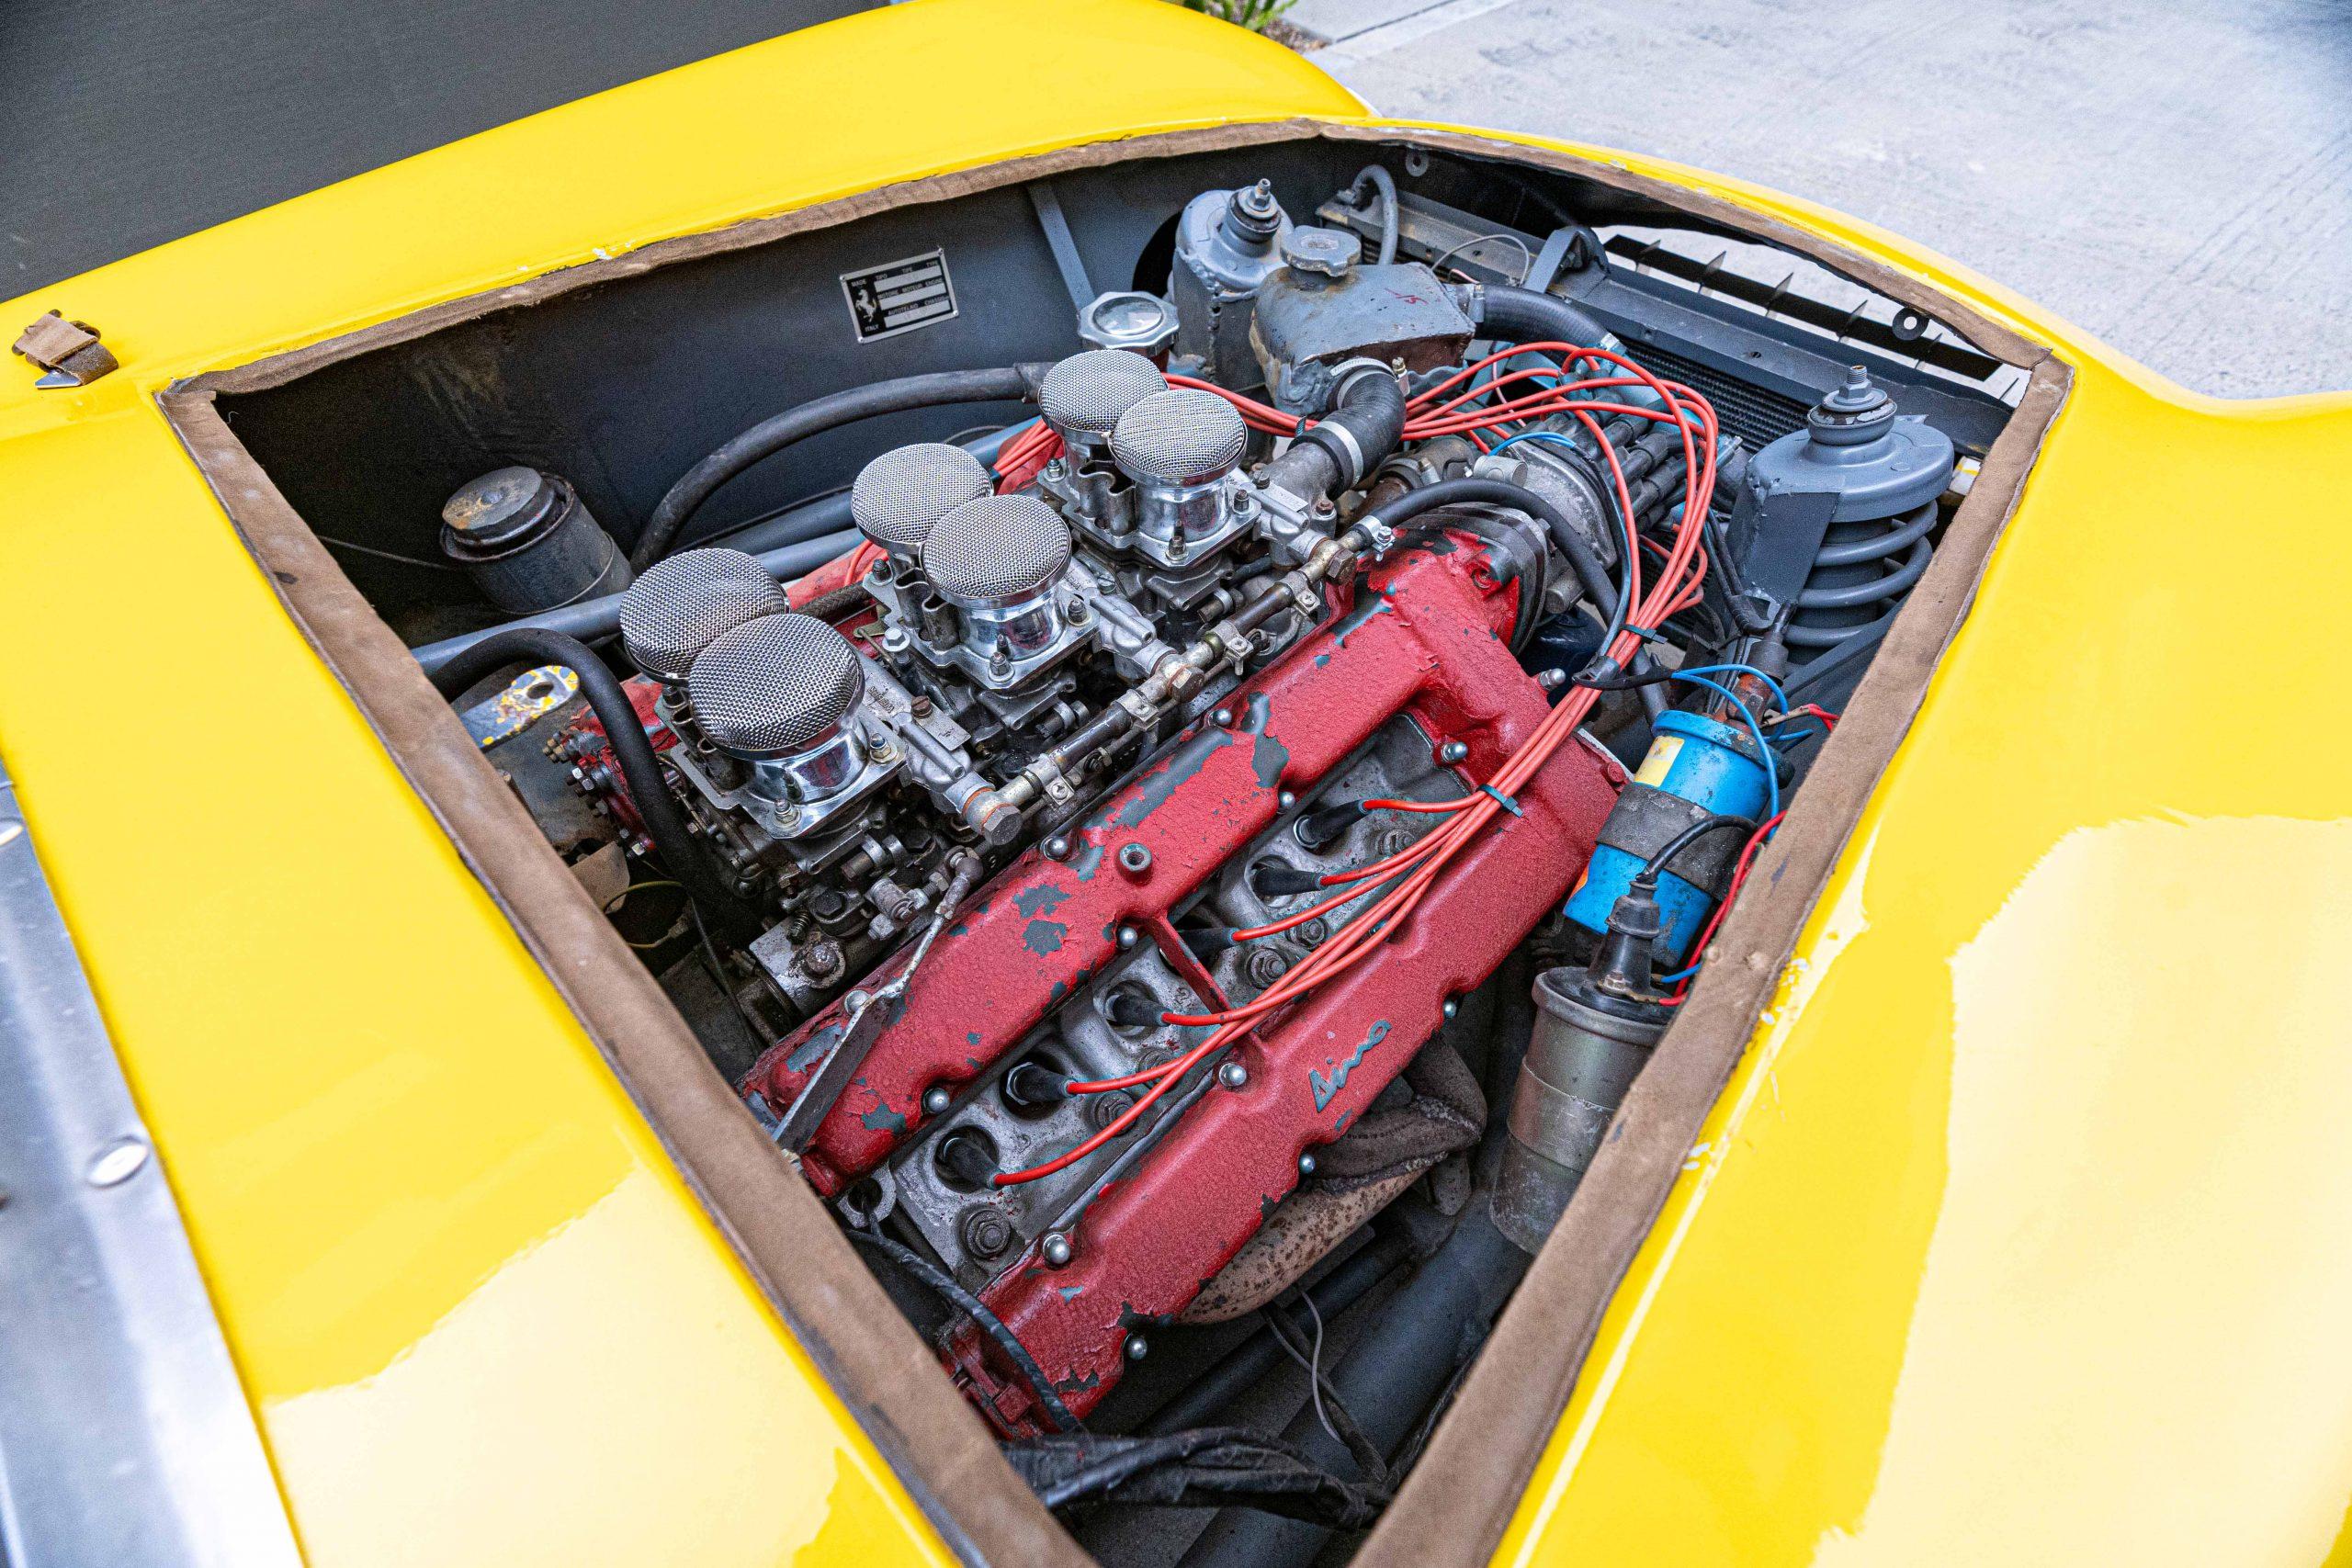 1957 Ferrari 196 SP Engine passenger view